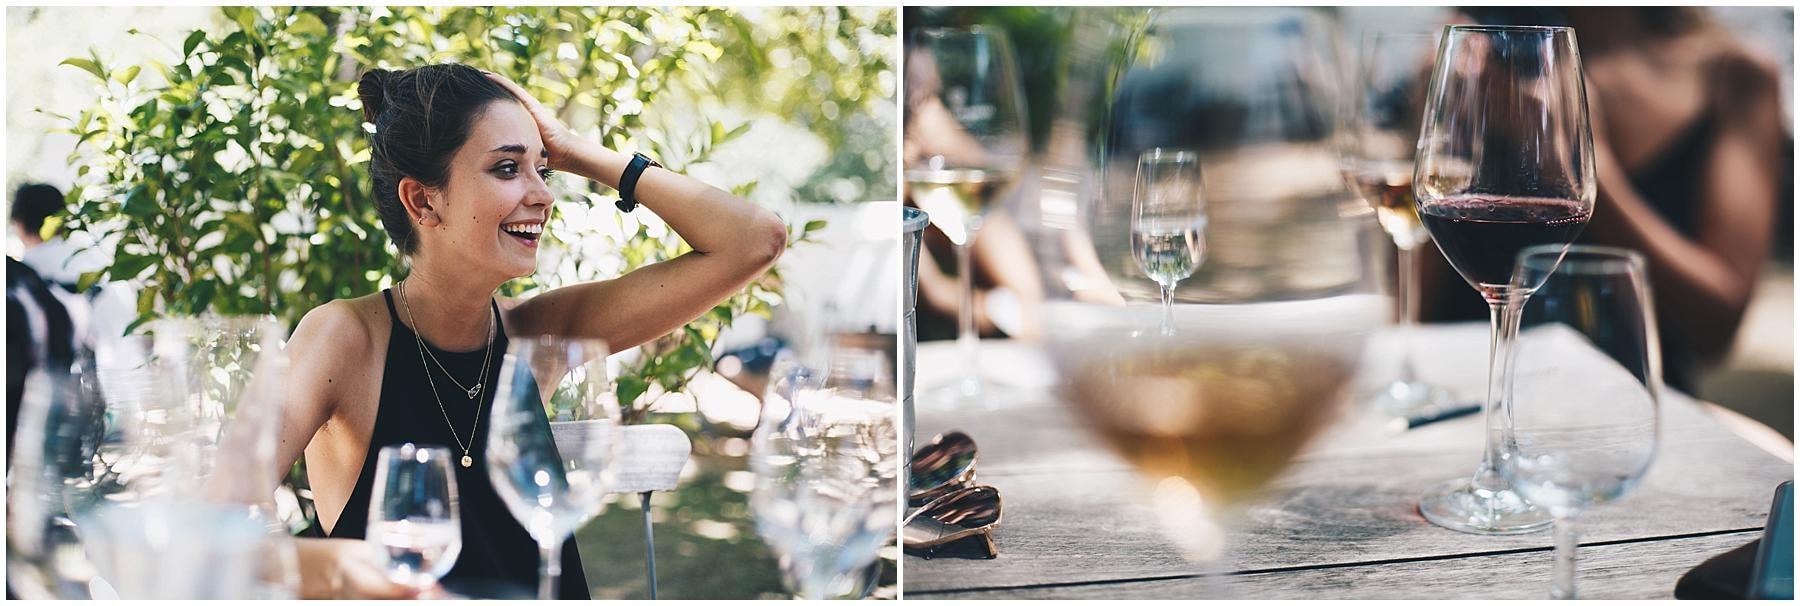 Cape Town_Winetasting_0071.jpg